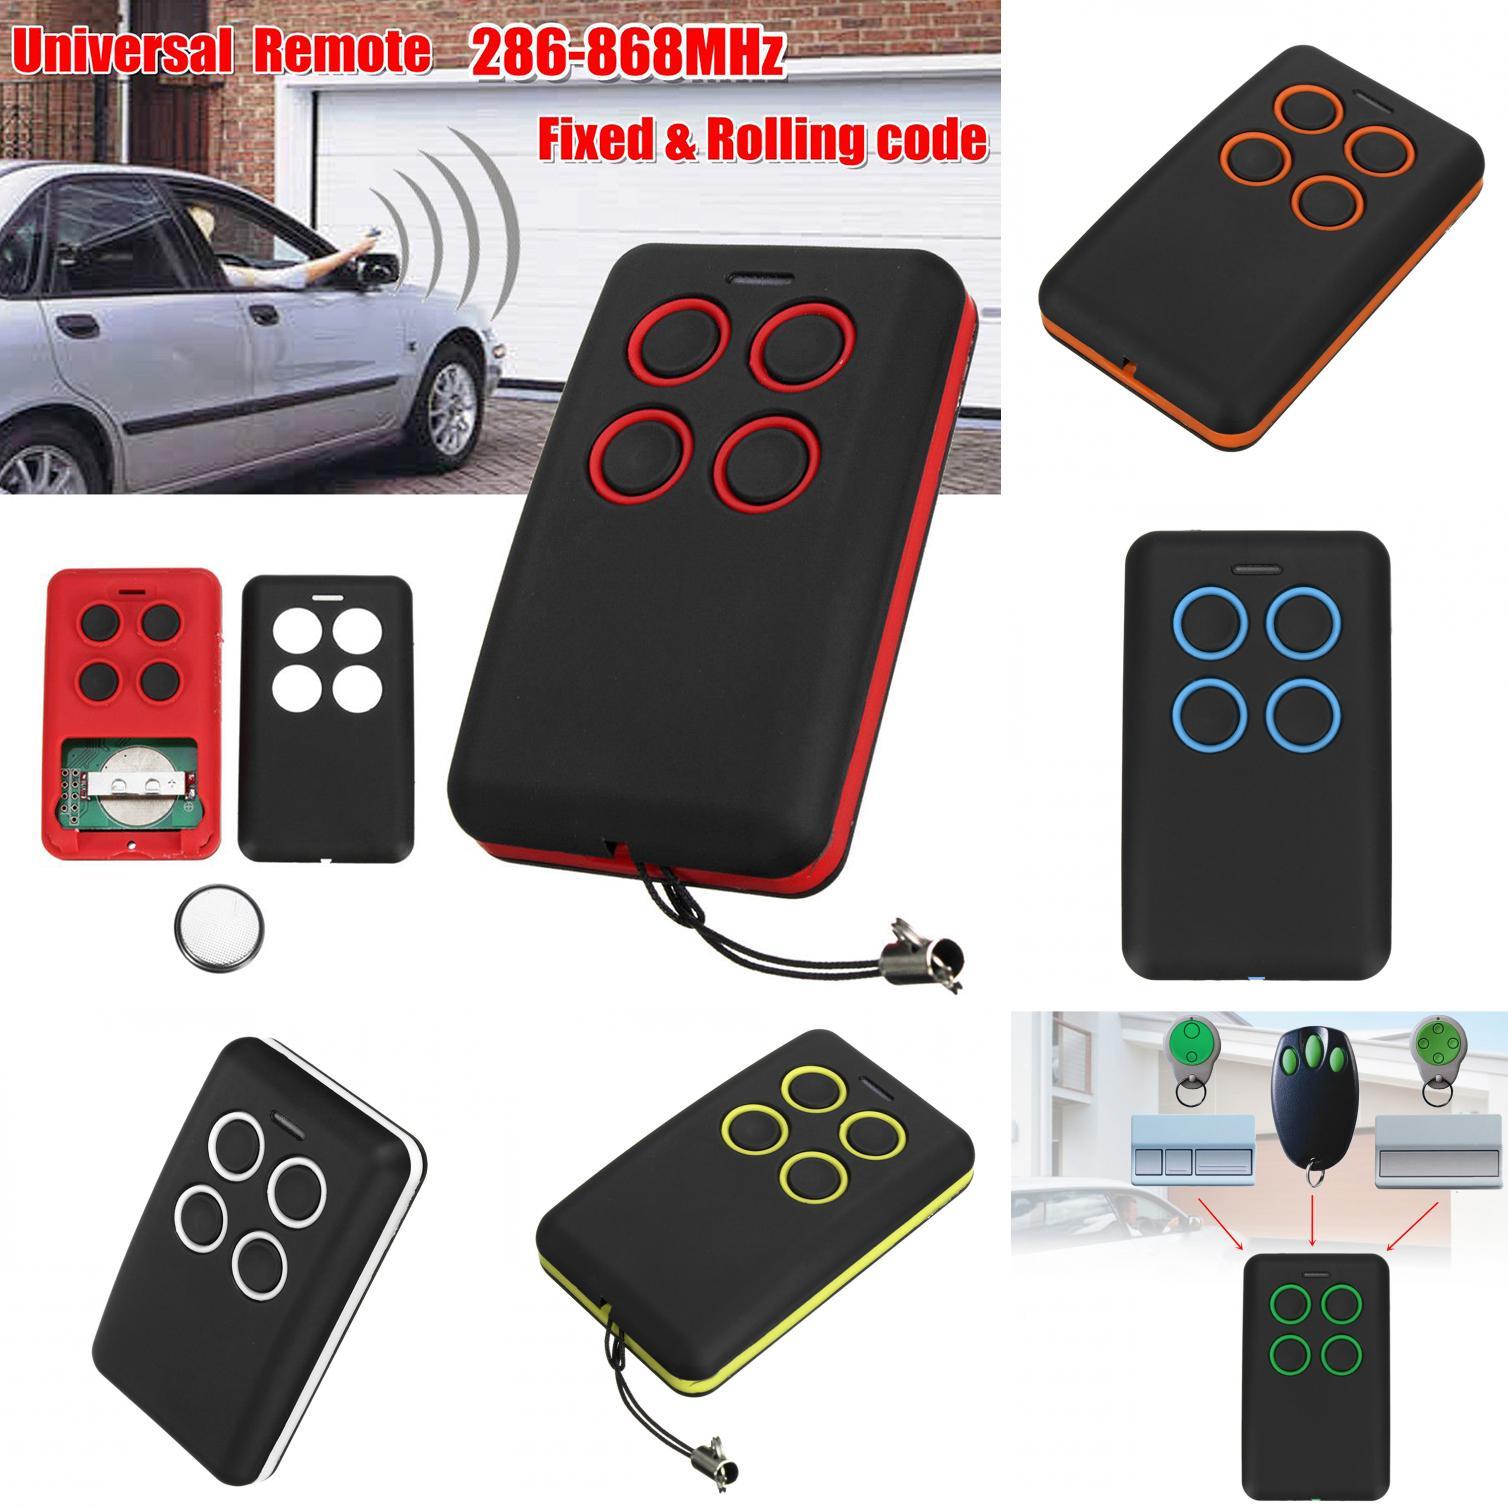 280-868MHz Universal Clone Remote Control Key Electric Gate Garage Door Remote#